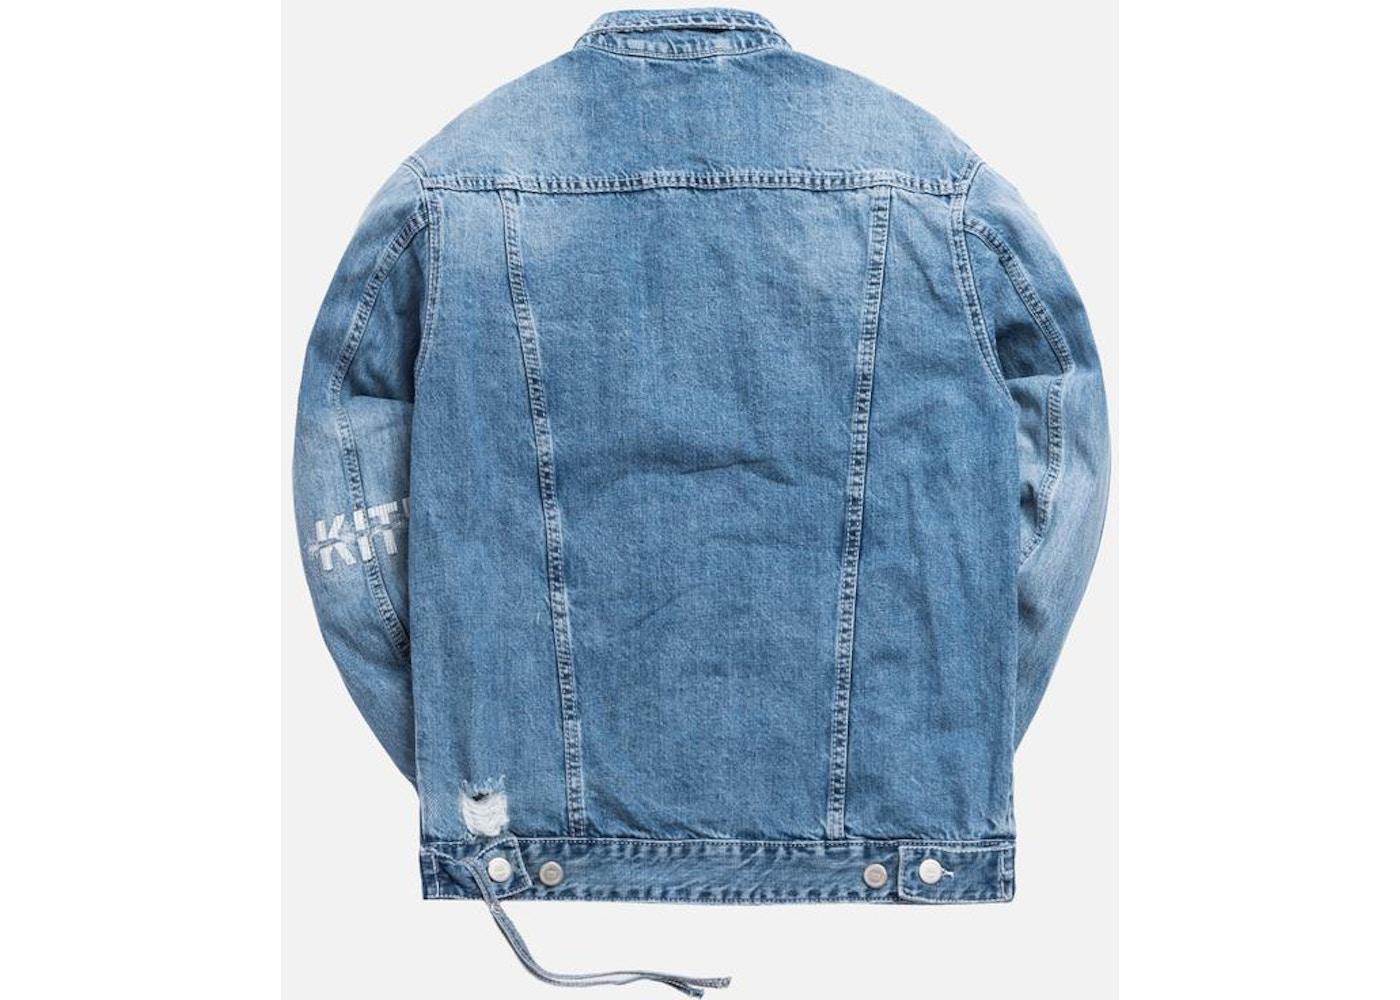 05c365f48 Kith Jackets - Buy & Sell Streetwear